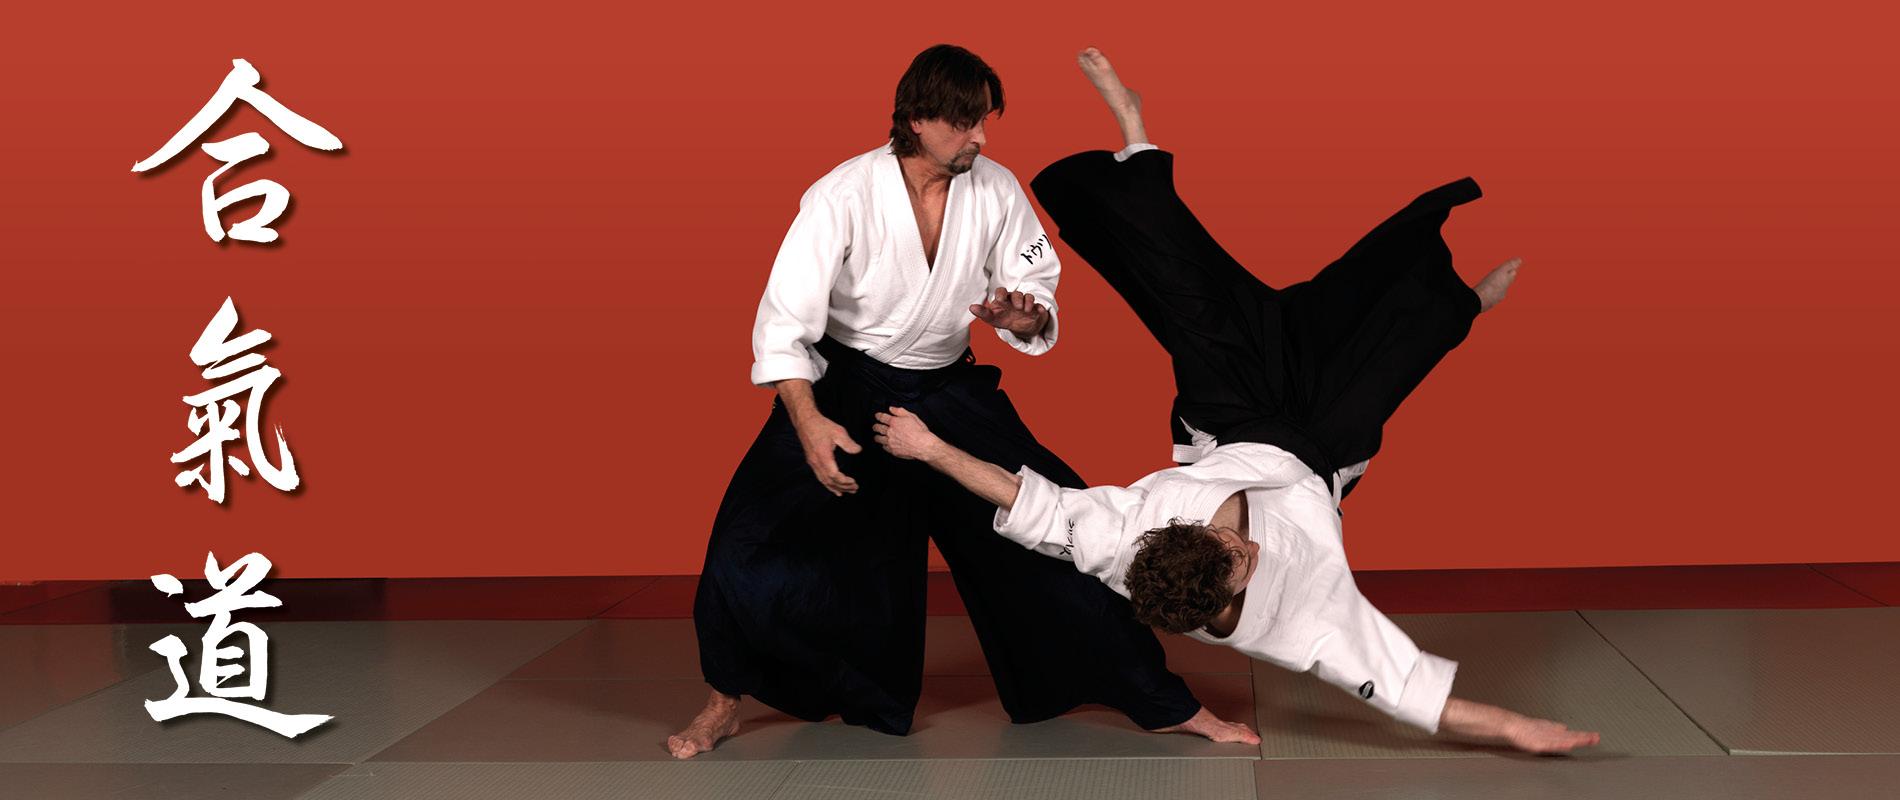 Aikido header afbeelding v4 1